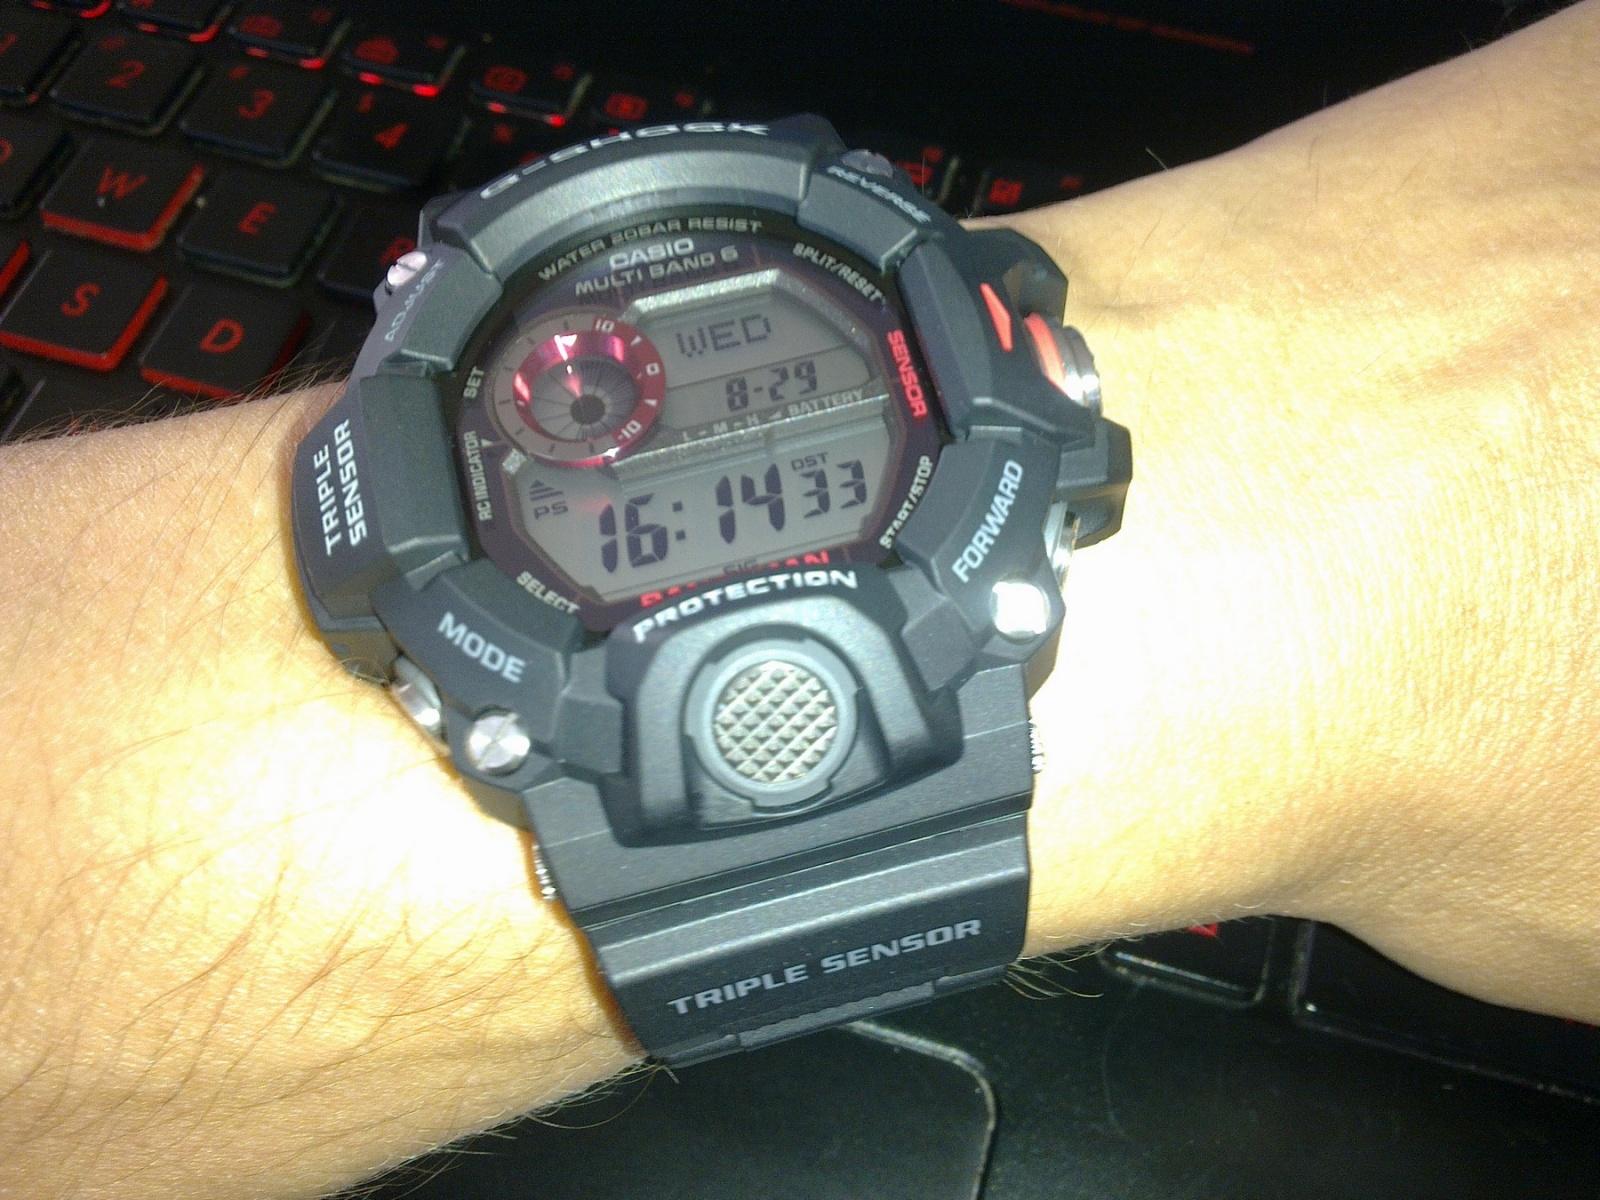 GW-9400 Rangeman